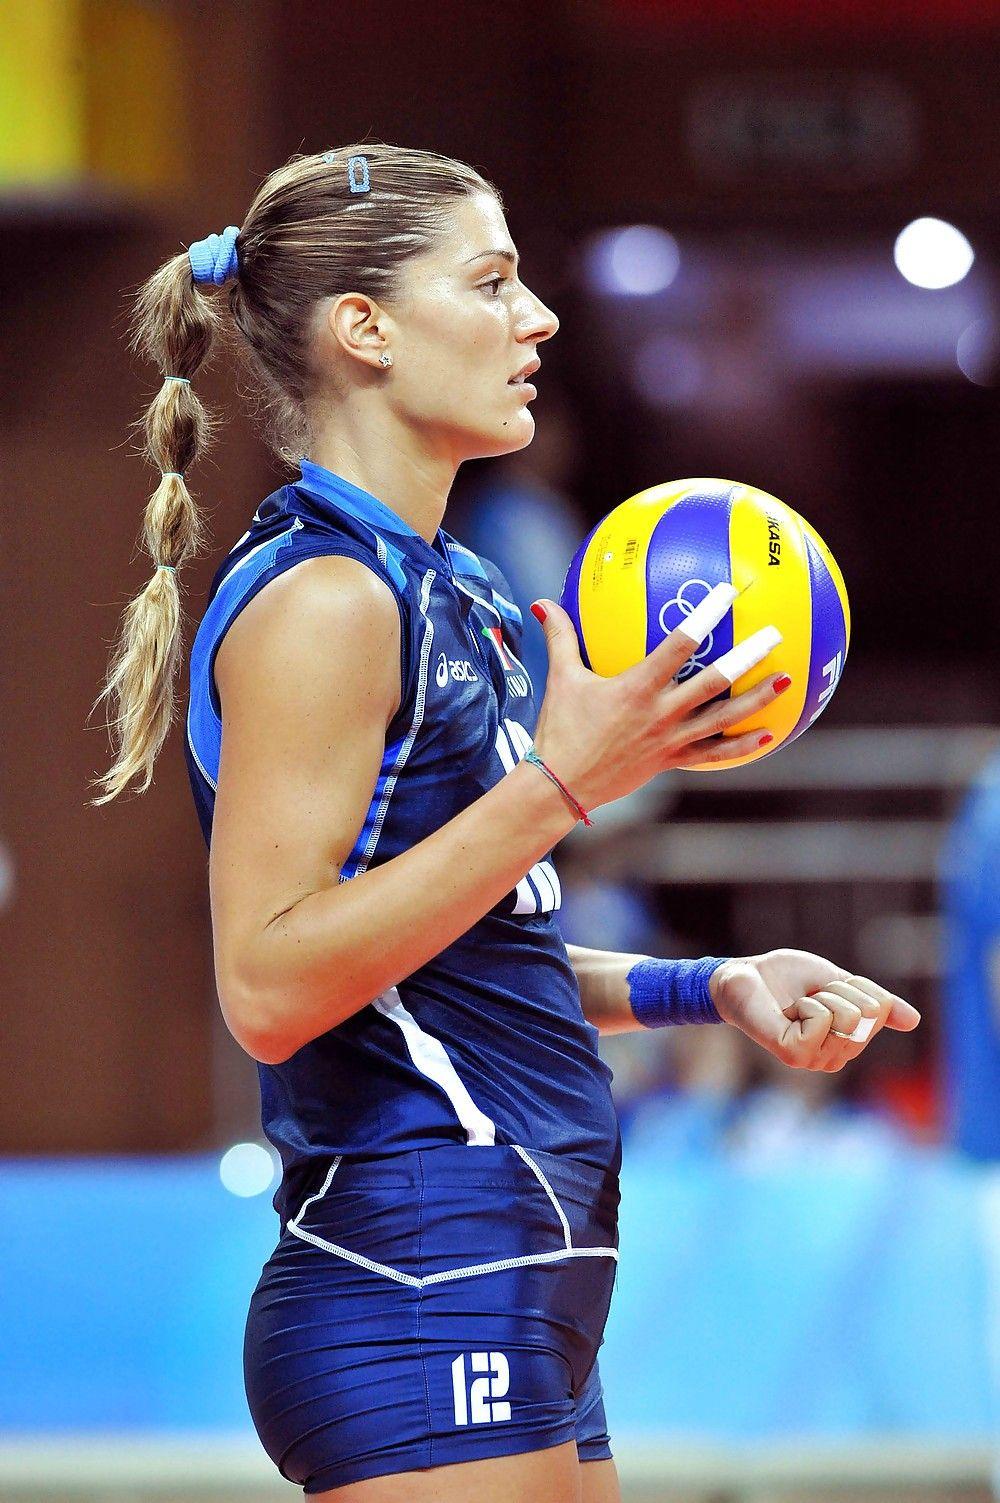 Francesca Piccinini Volleyball Players Female Volleyball Players Women Volleyball